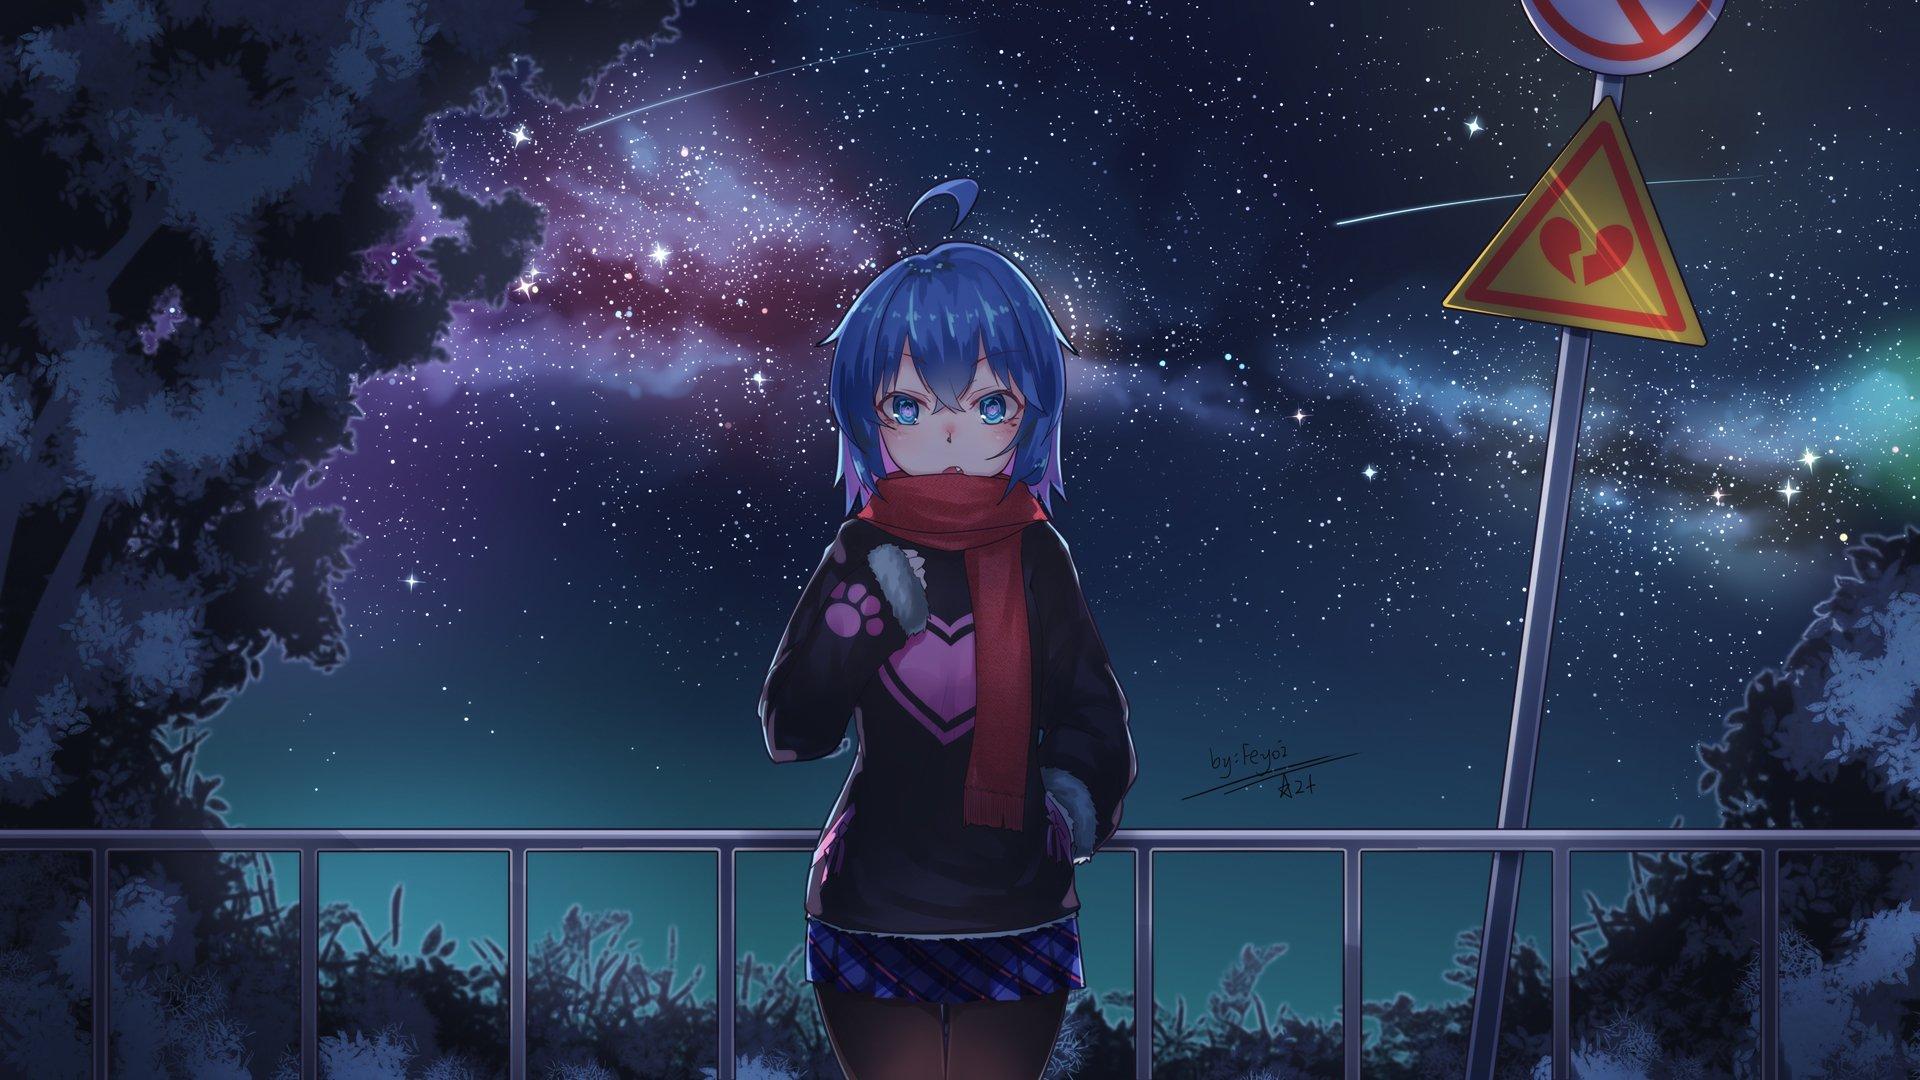 Unduh 5000+ Wallpaper Abyss Anime Original  Terbaik